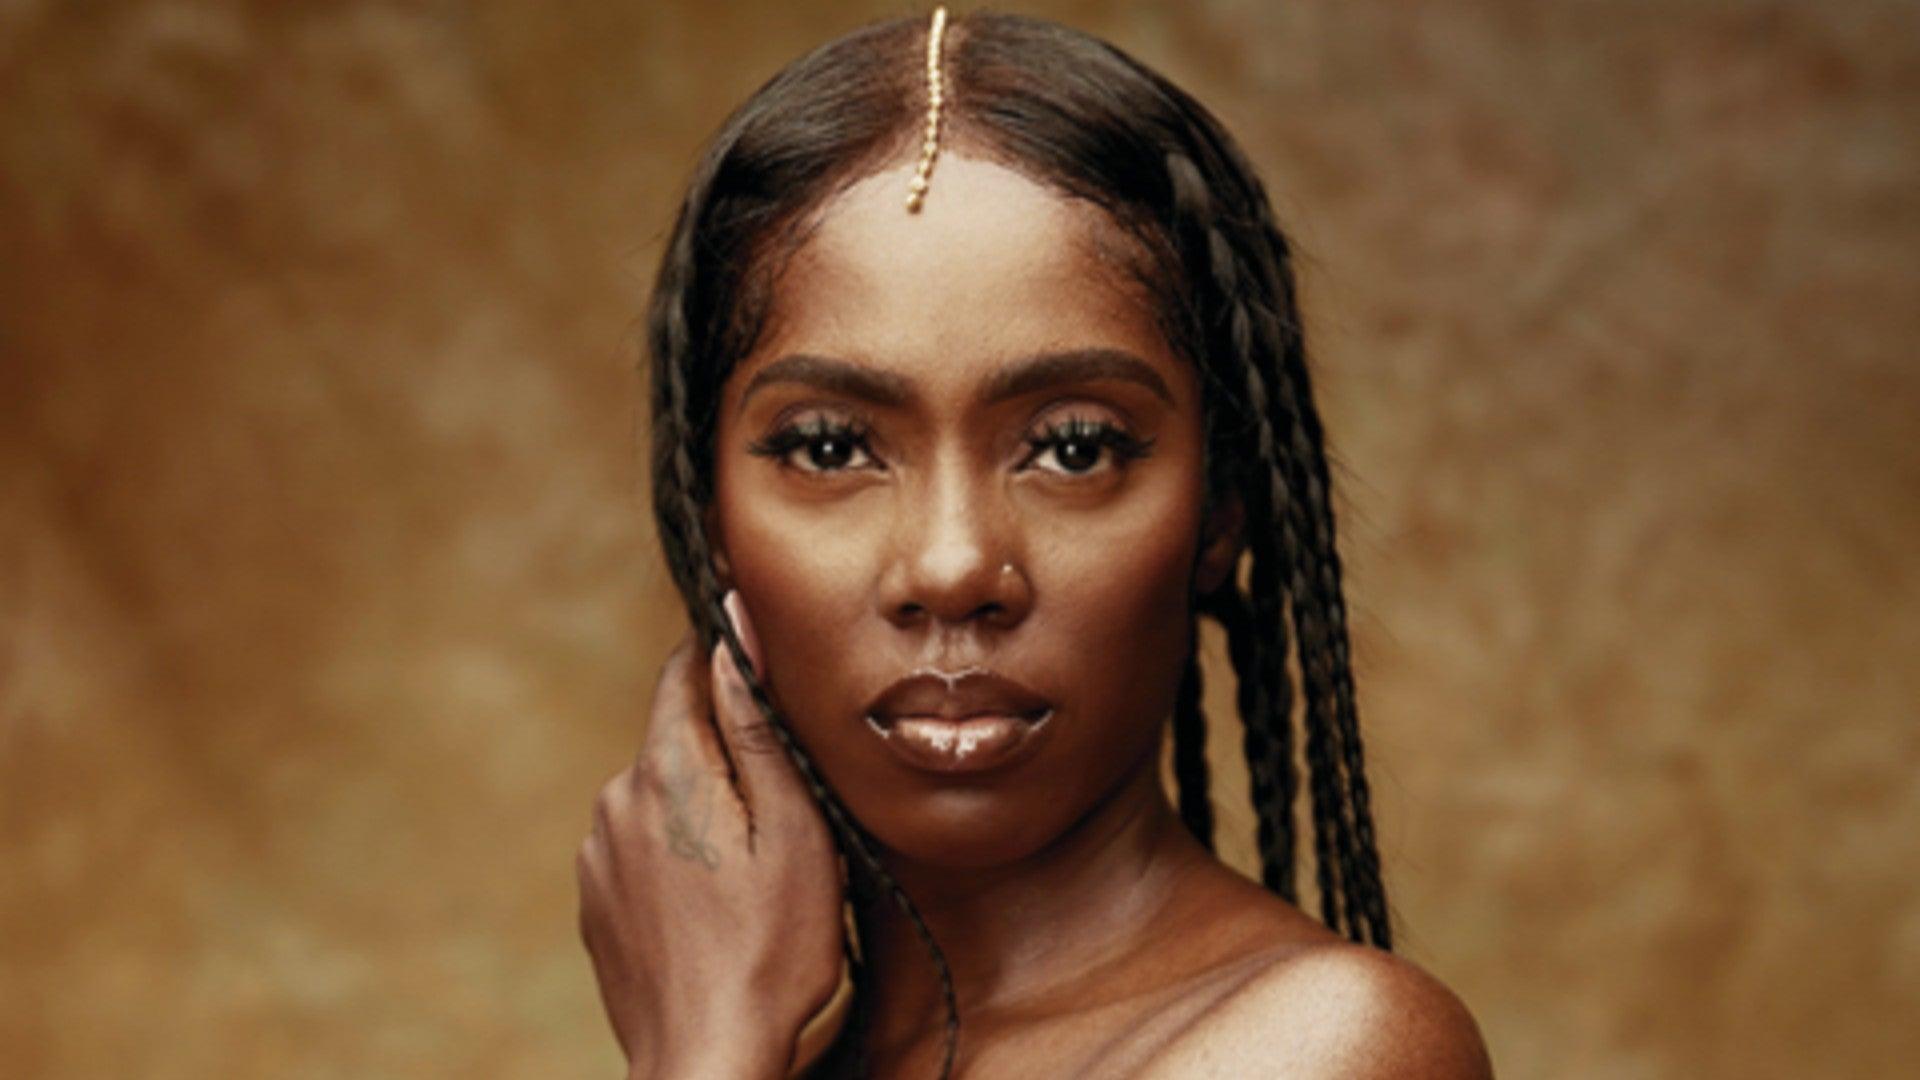 Tiwa Savage Shares Her Keys To Radiant Skin